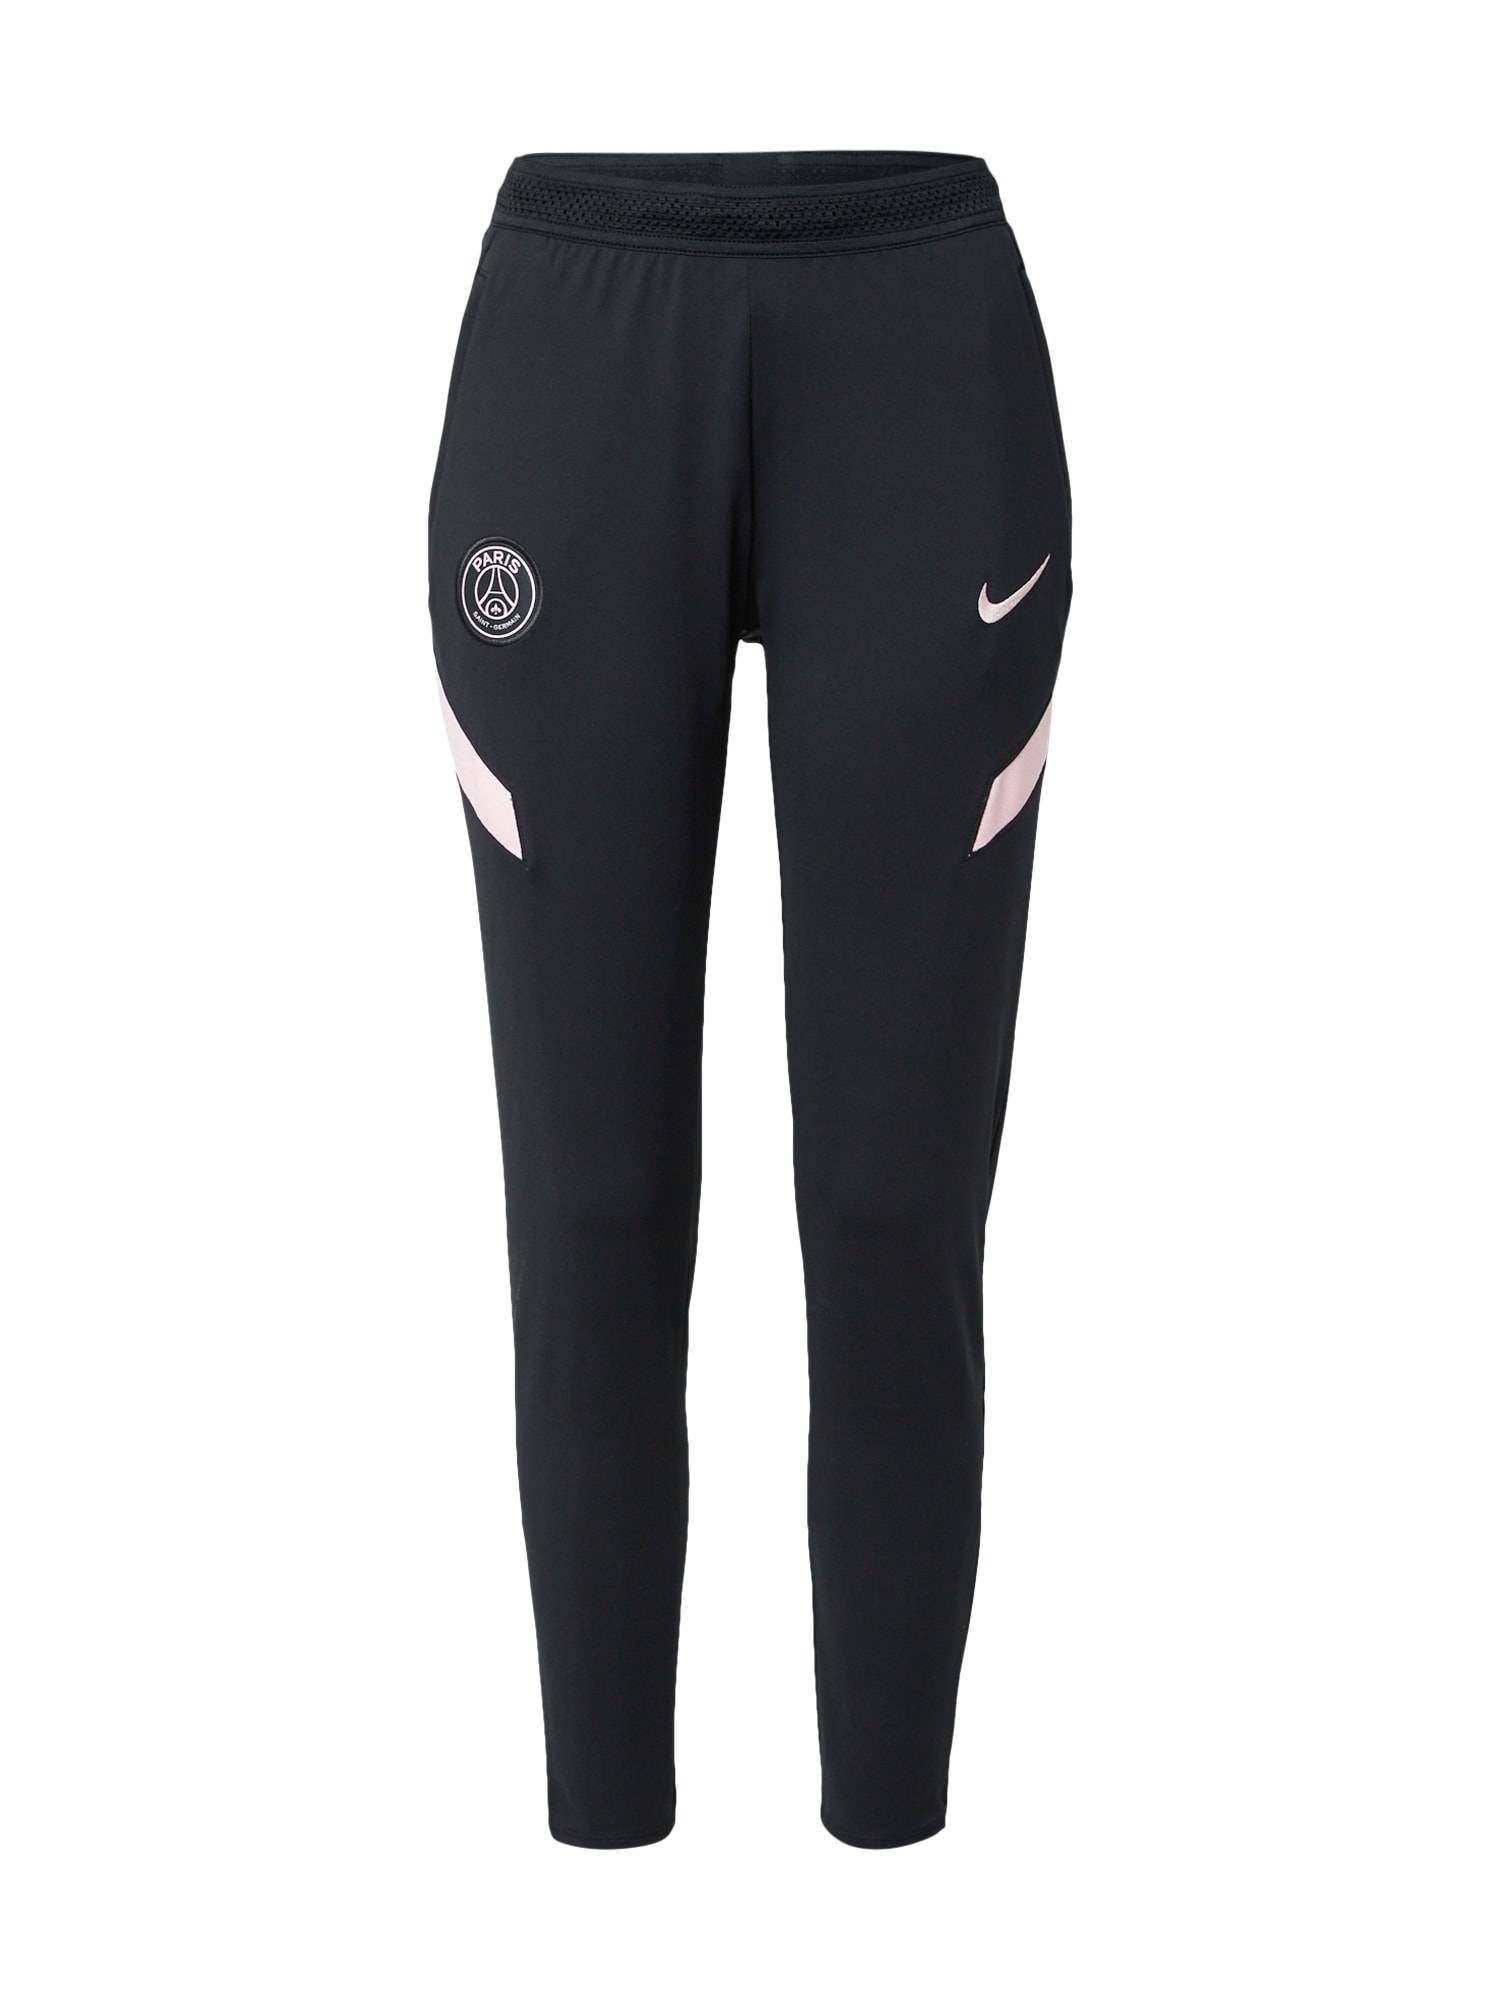 NIKE Pantalon de sport 'Paris Saint-Germain Strike'  - Noir - Taille: XL - female